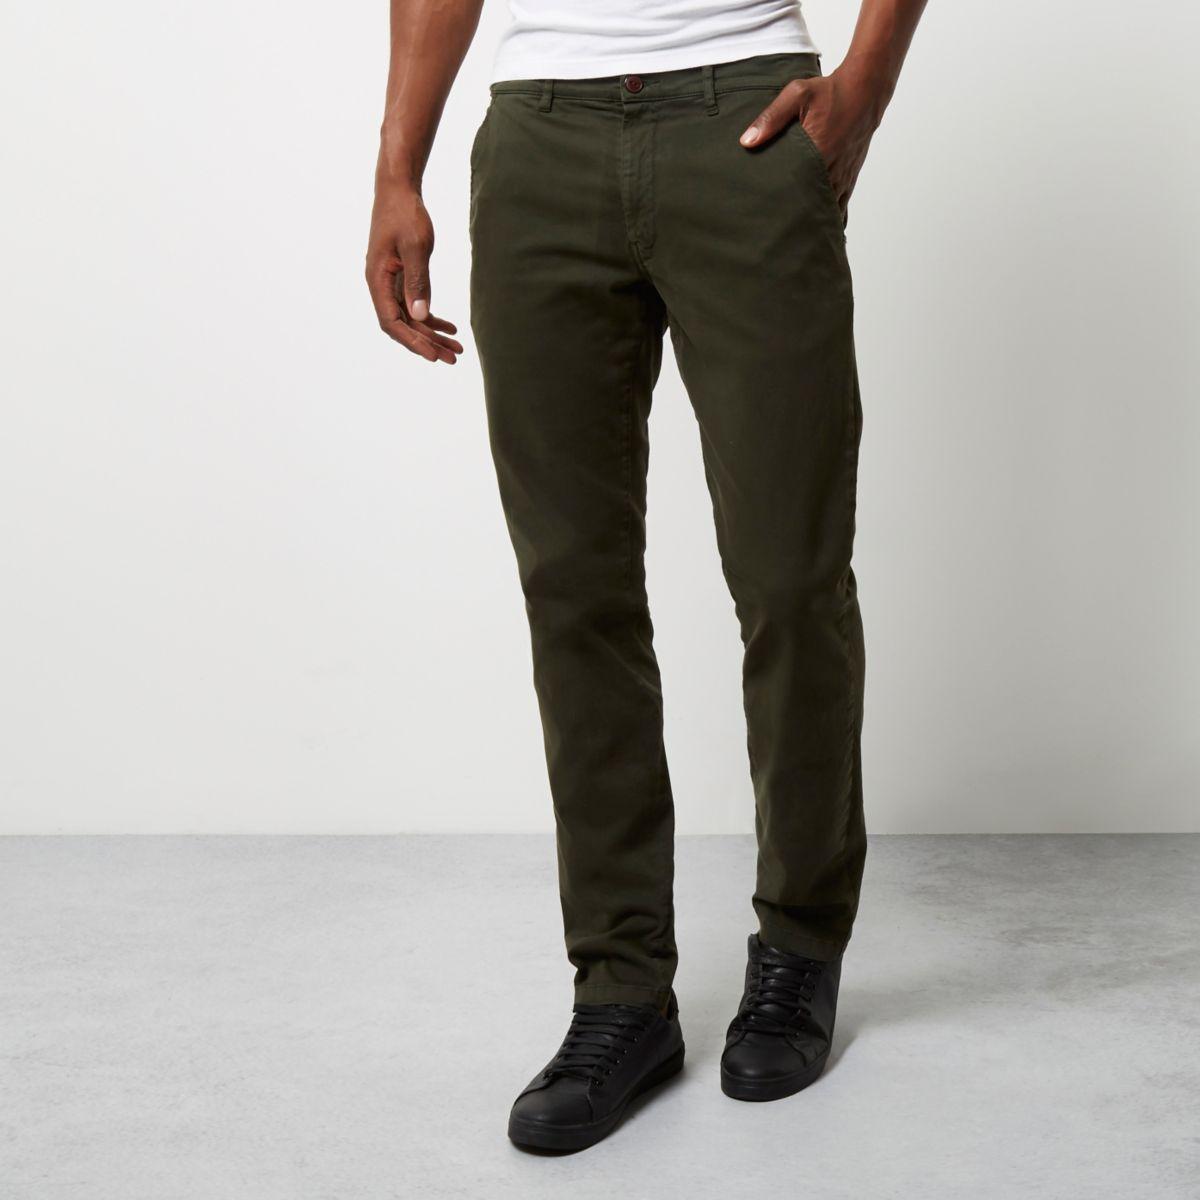 Khaki Franklin & Marshall skinny trousers